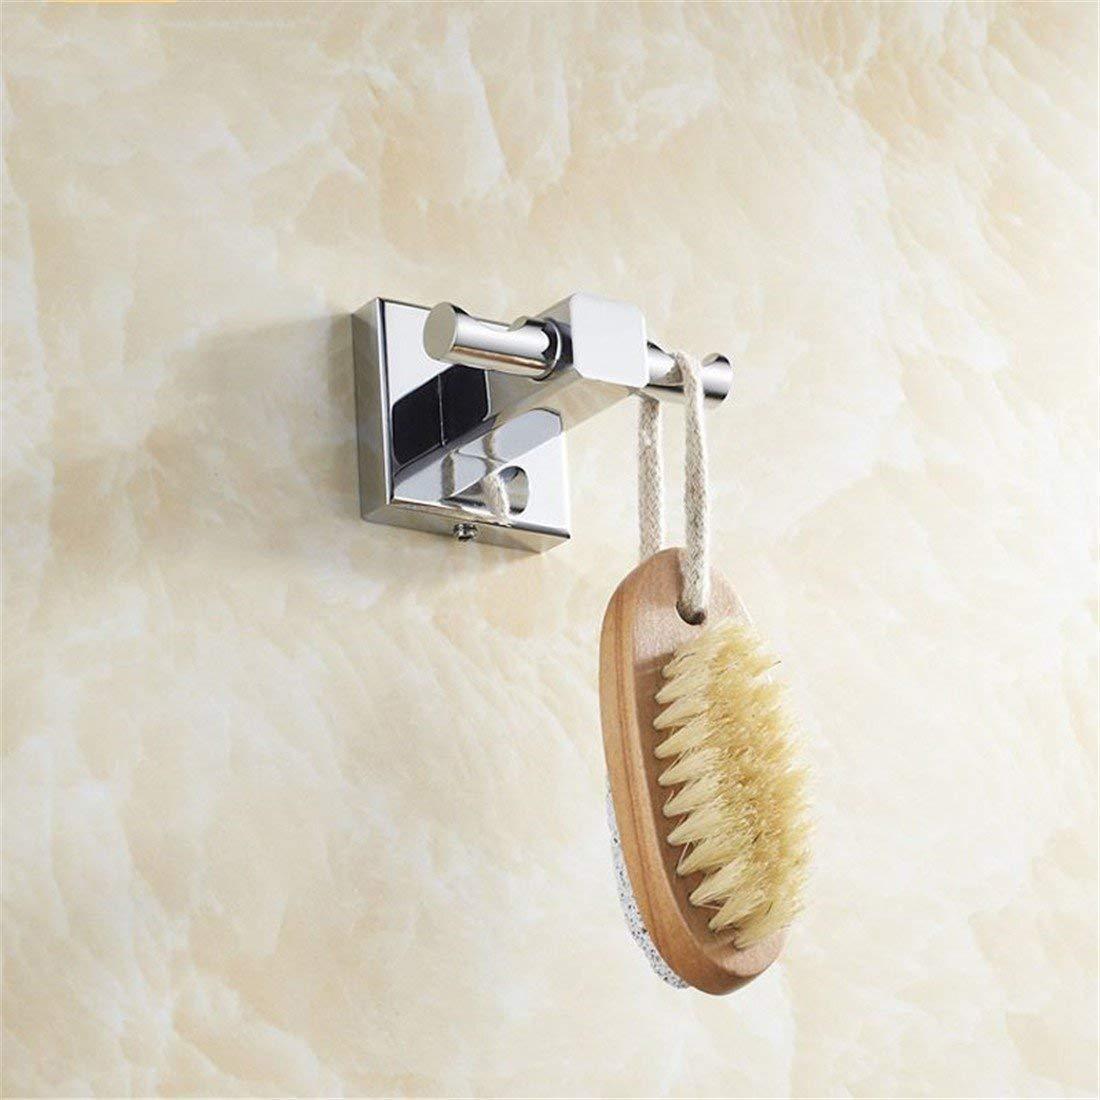 LAONA A contemporary minimalist Brass chrome bathroom accessory kit bath towel rack Towel racks, Coat Hook